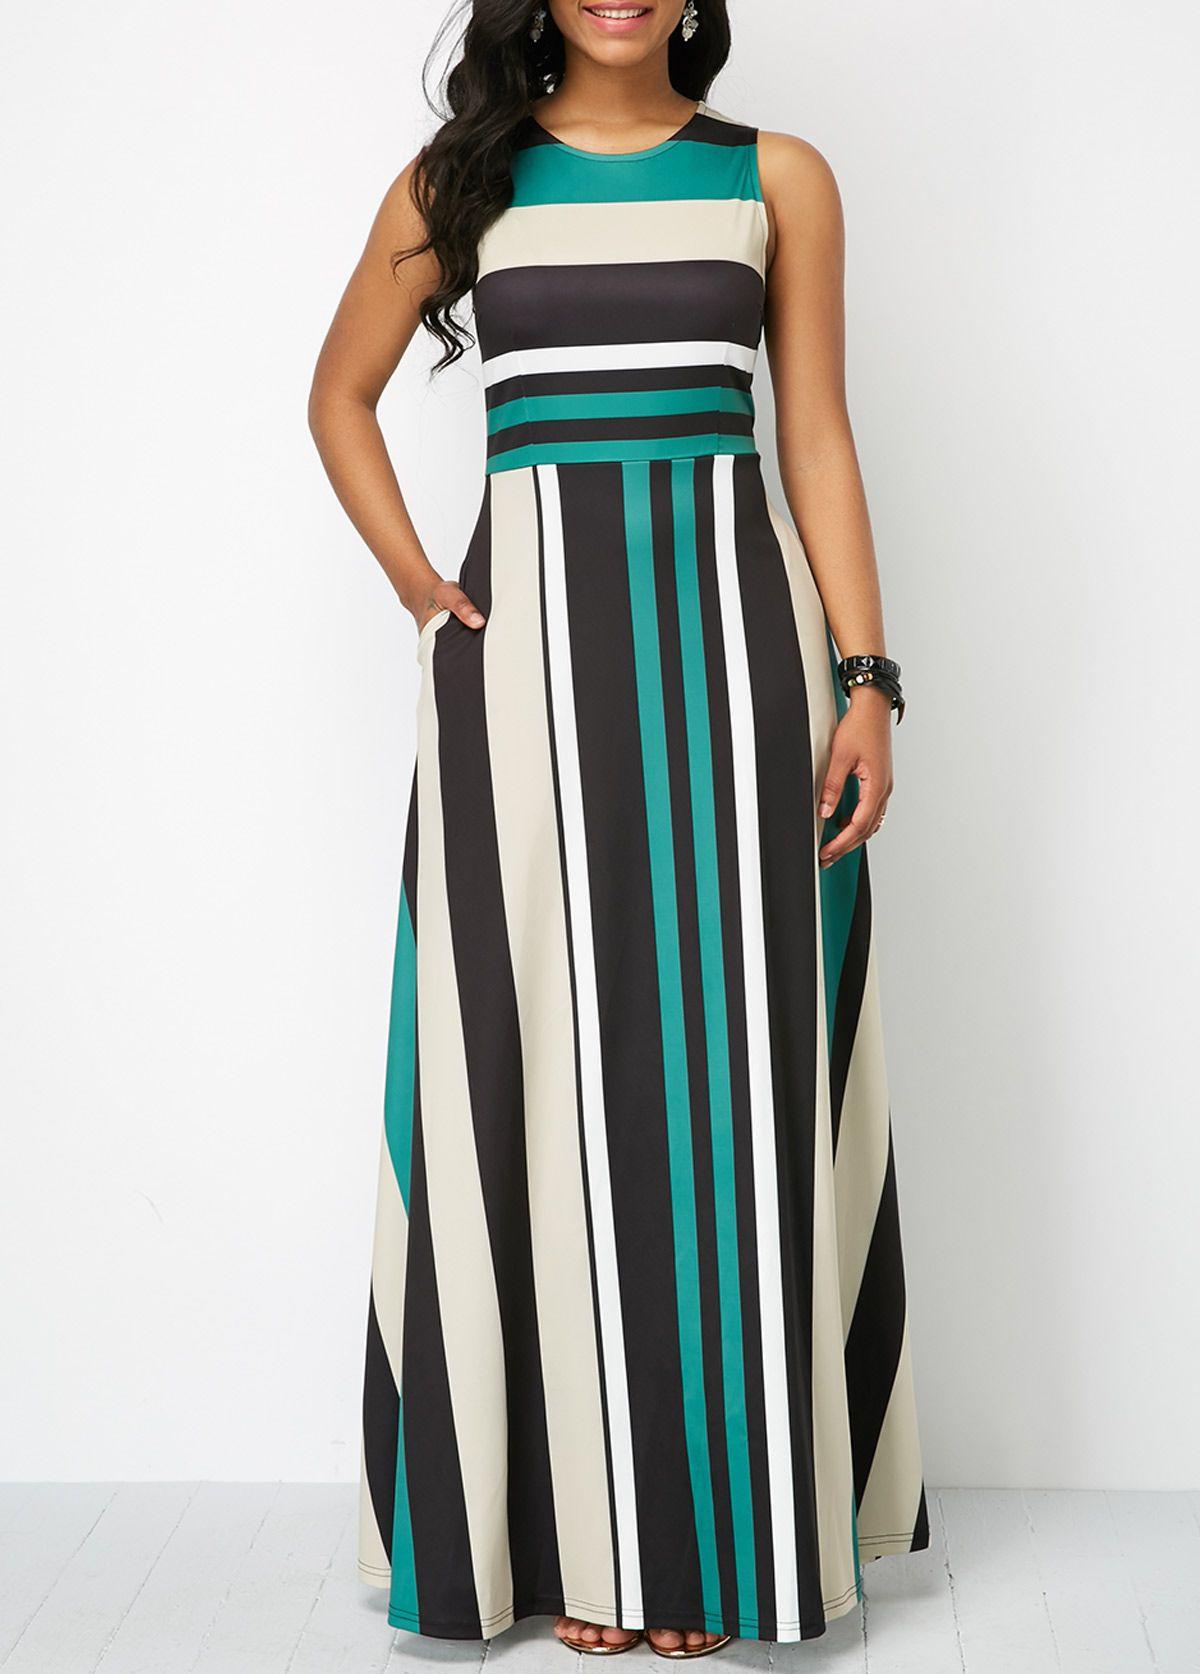 117259265b Stripe Print Pocket Zipper Back Sleeveless Maxi Dress | Rosewe.com - USD  $32.54